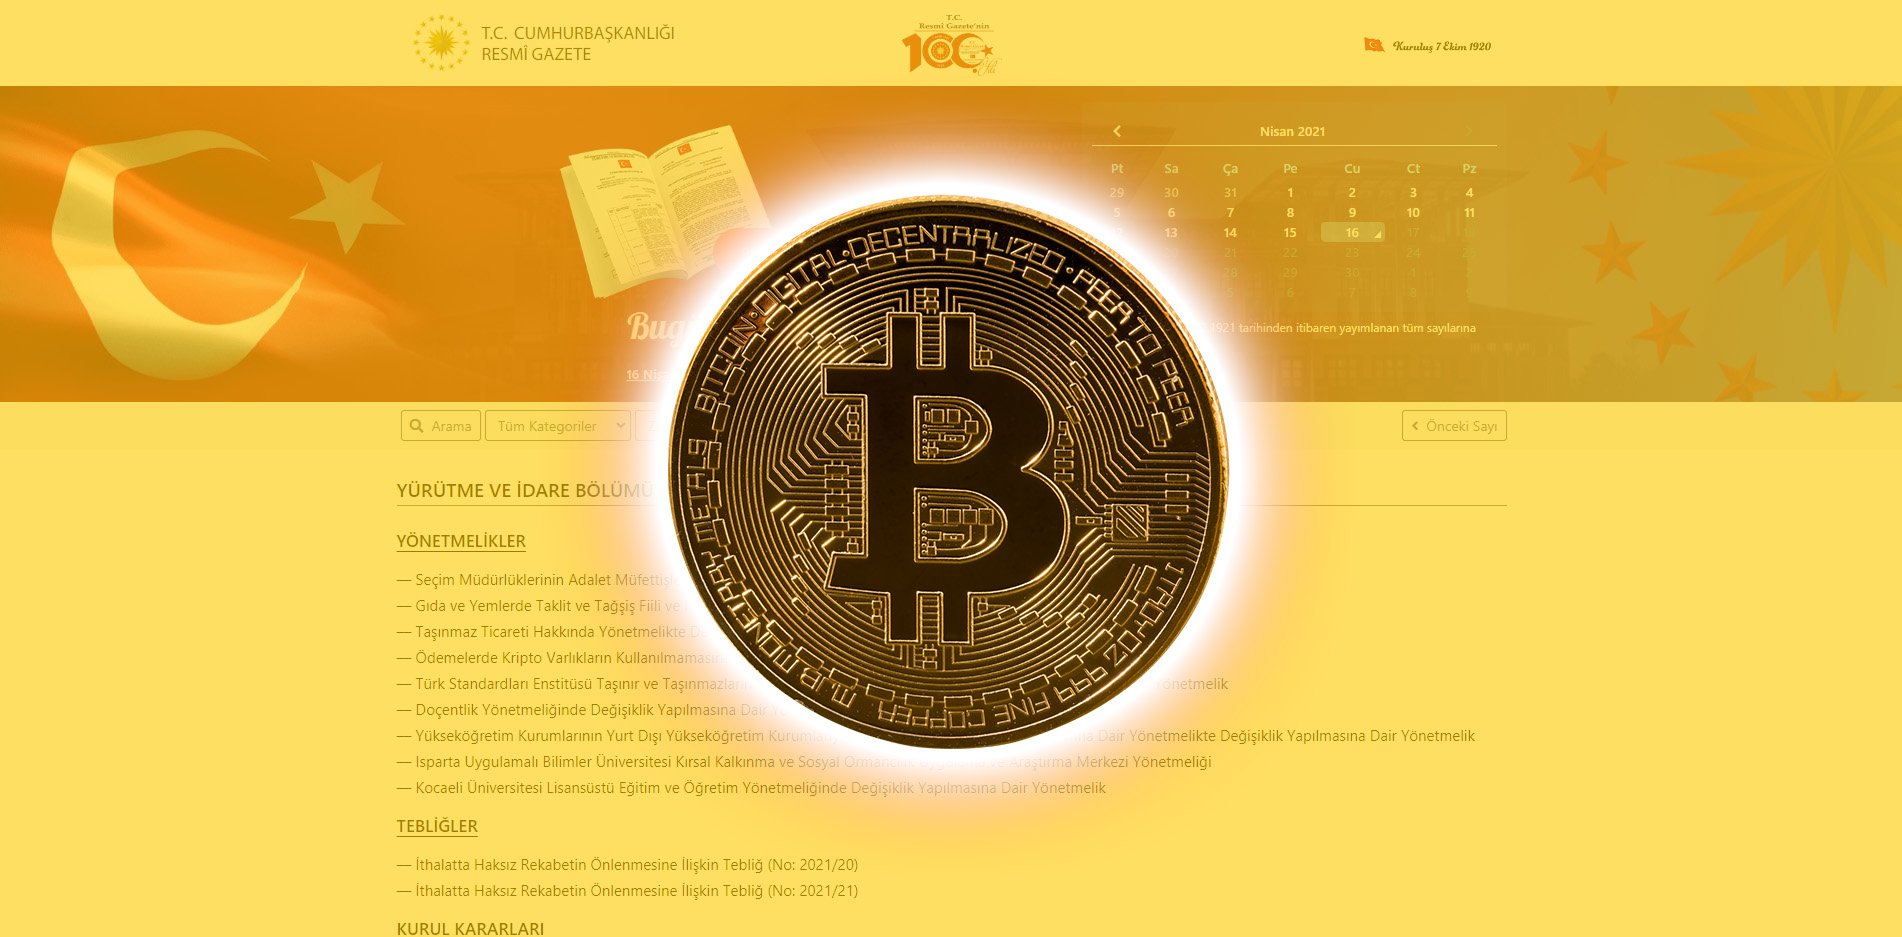 resmi gazete kripto varlık